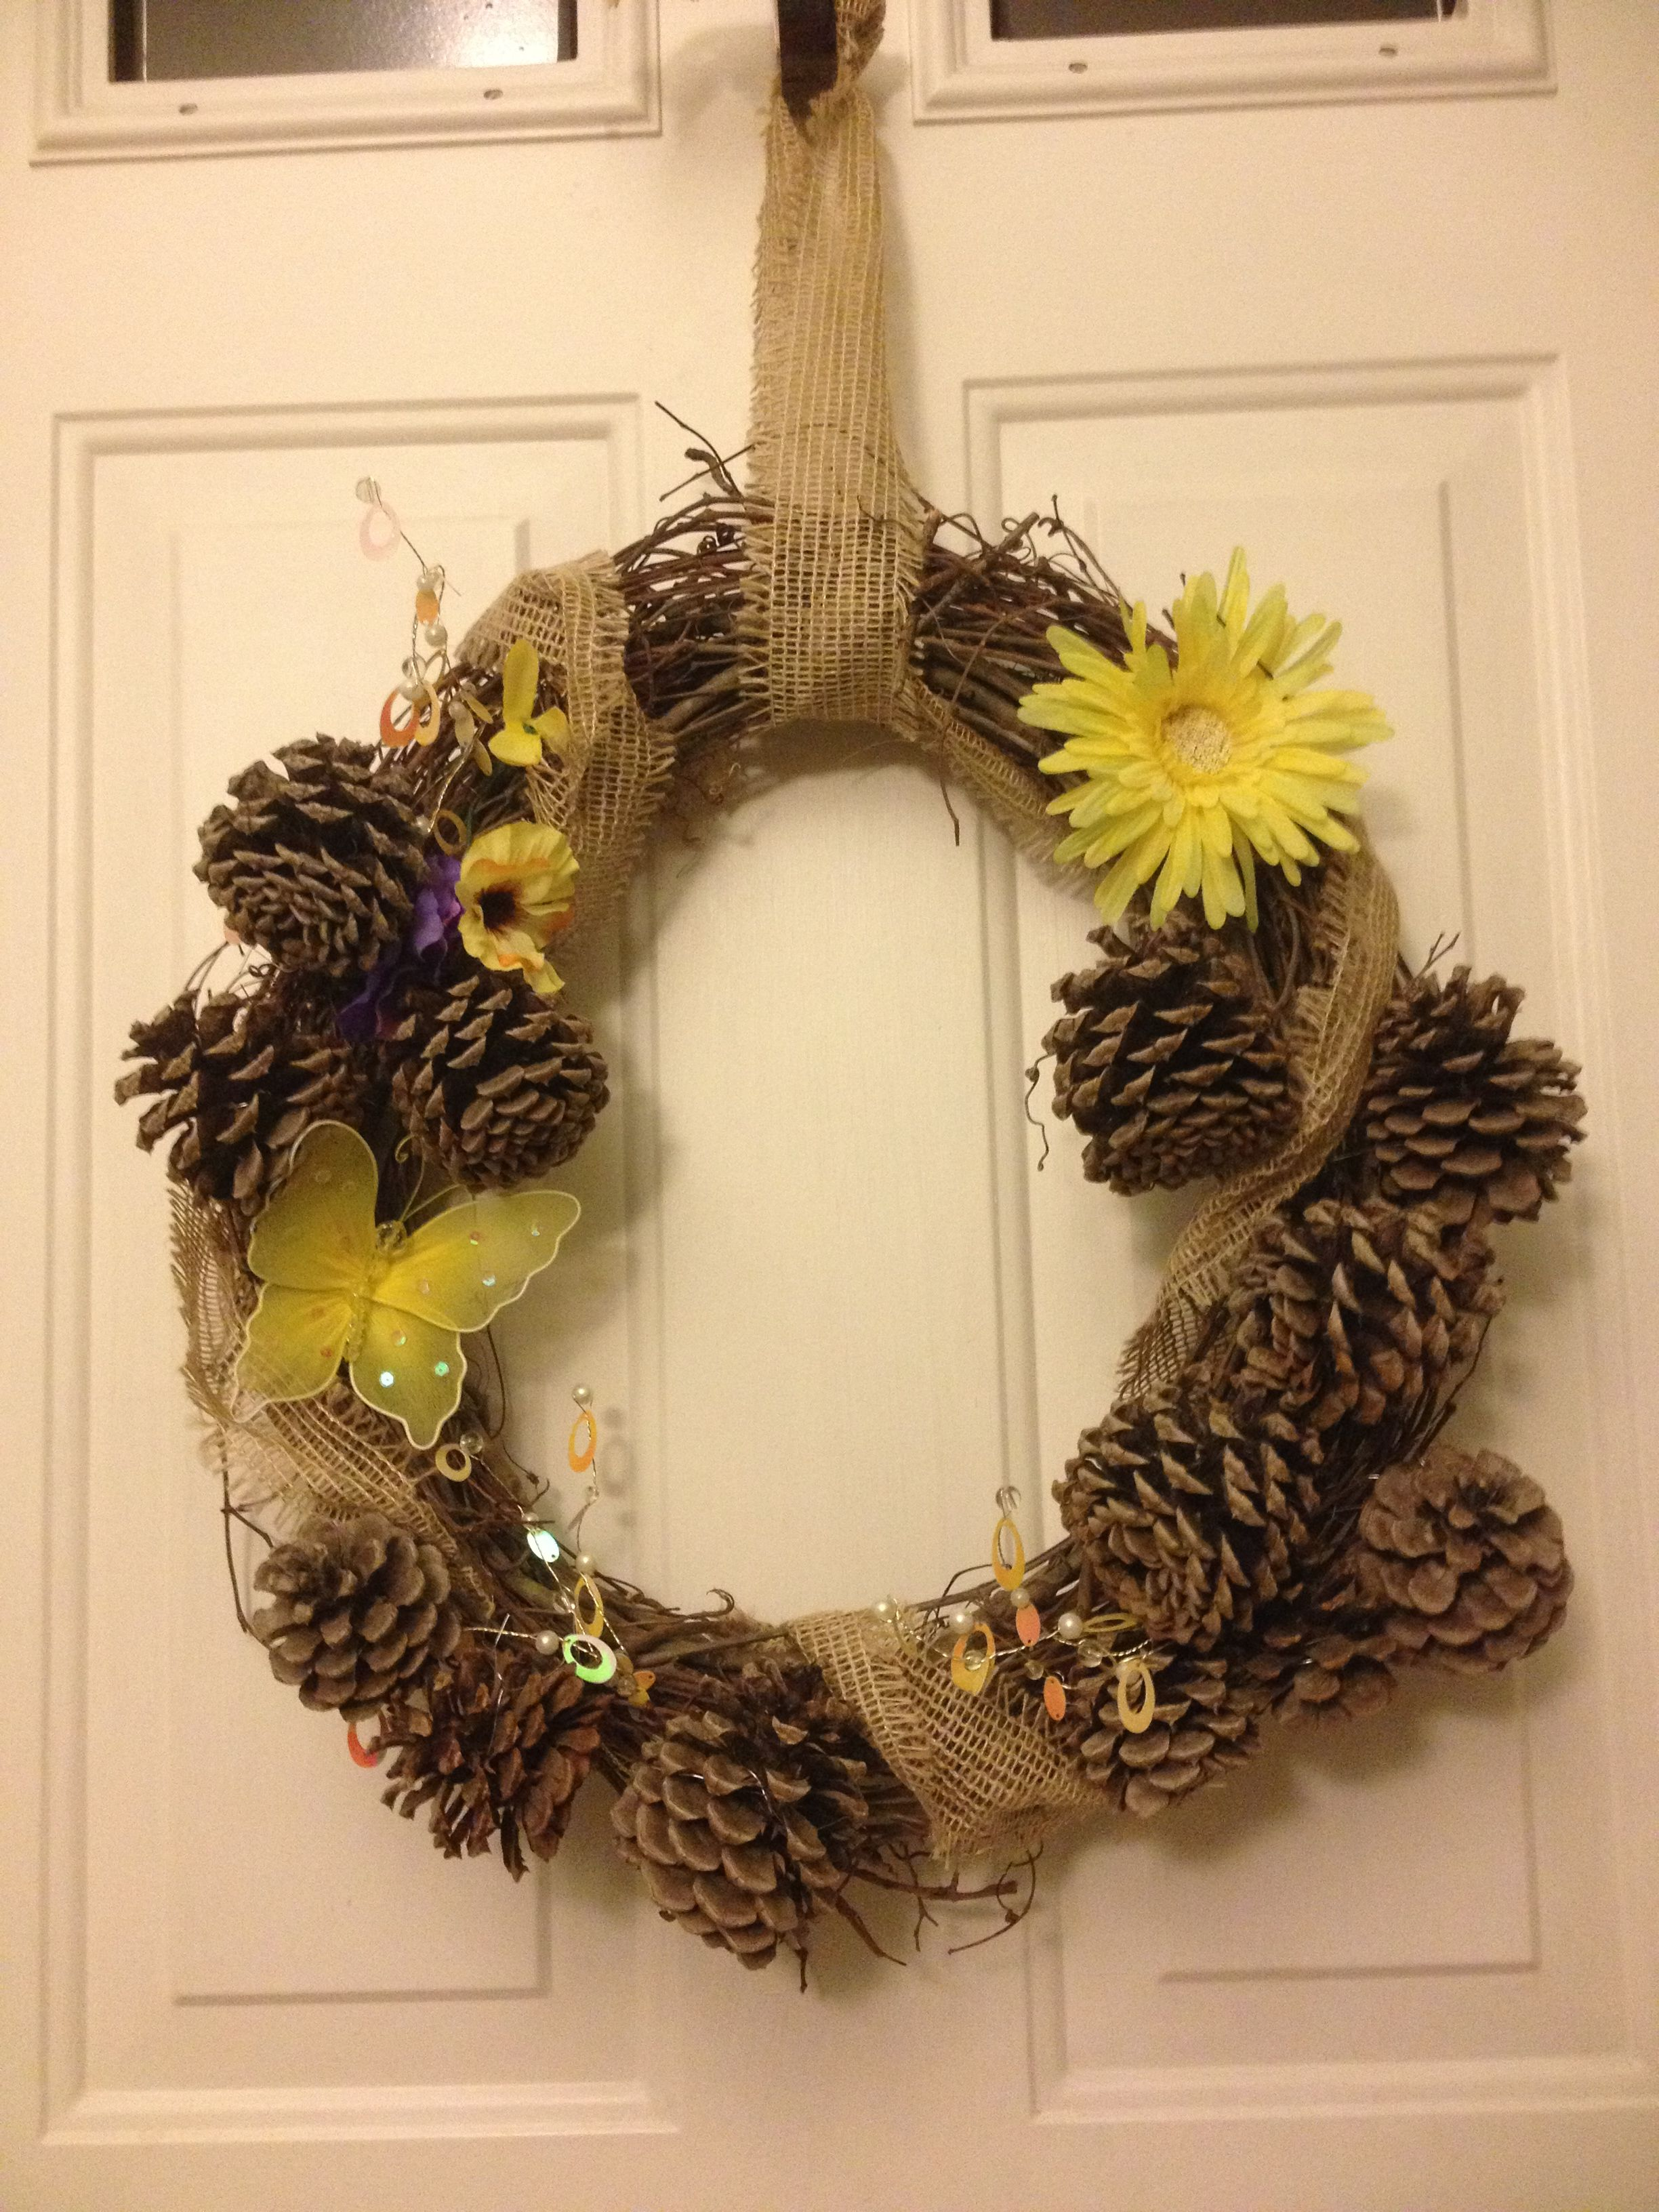 Diy summer country wreath wreaths pinterest for Diy summer wreath